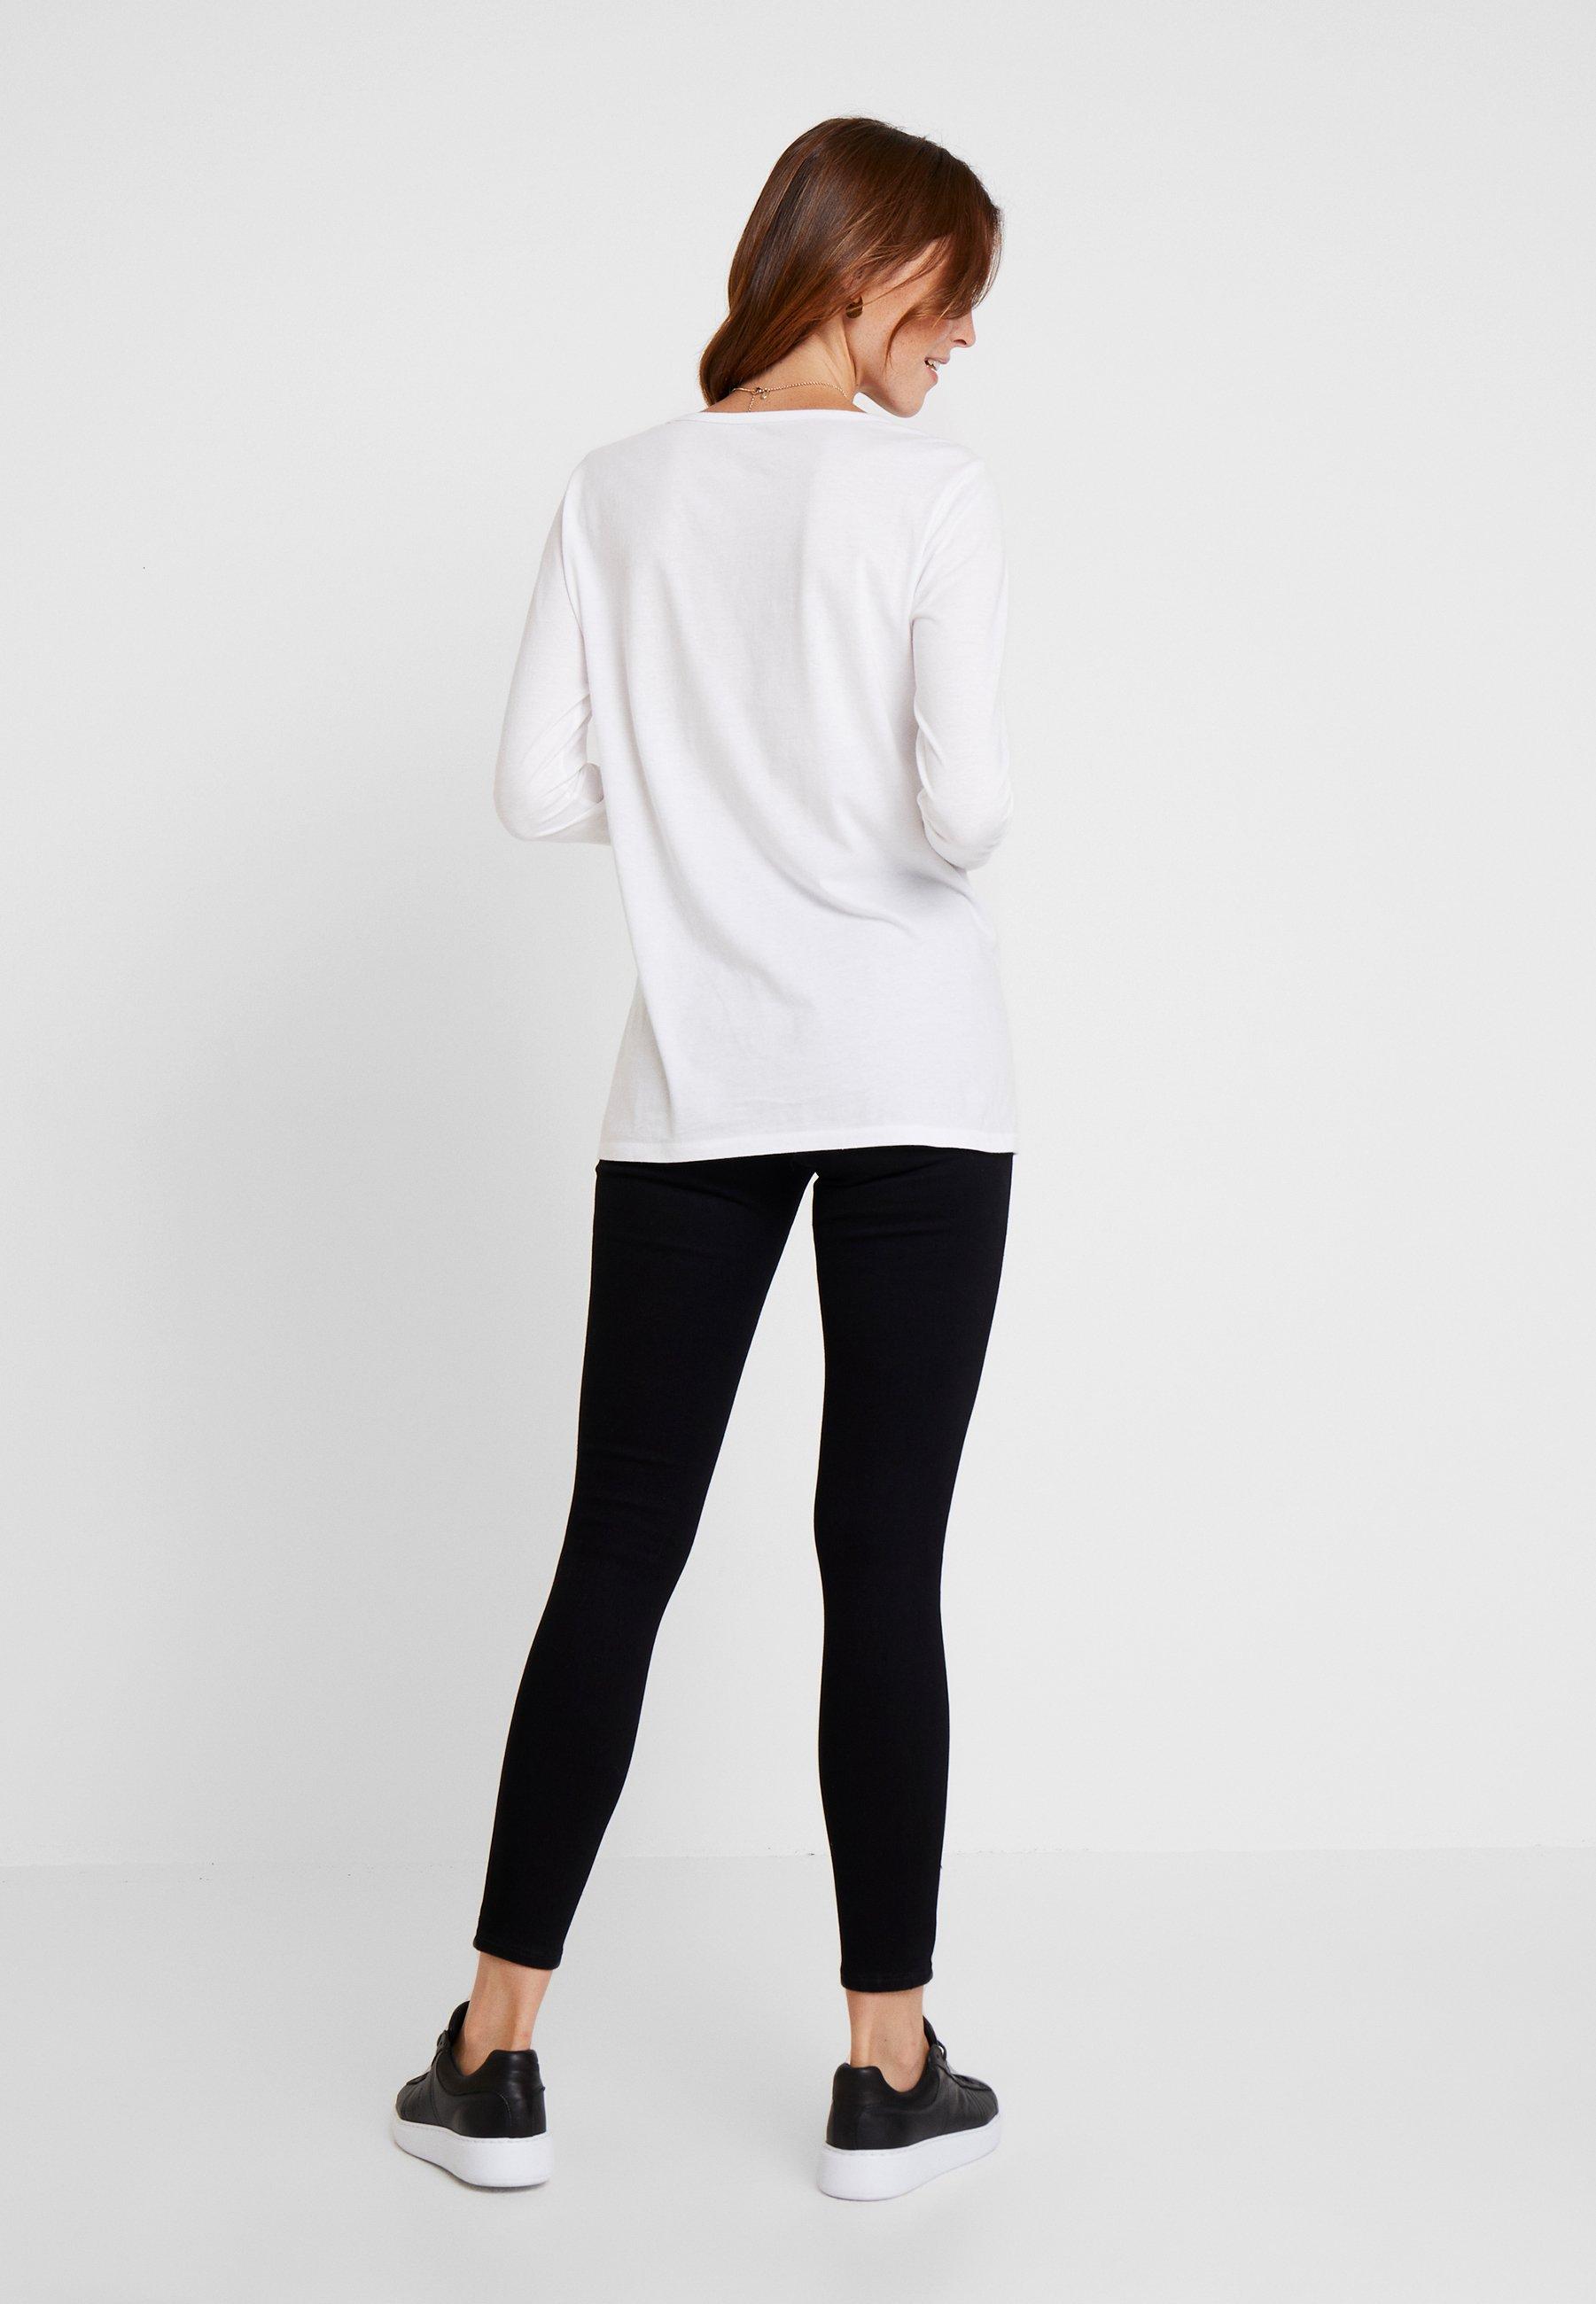 Longues TeeT Manches Arch Gap shirt White À OiwlZkuTPX